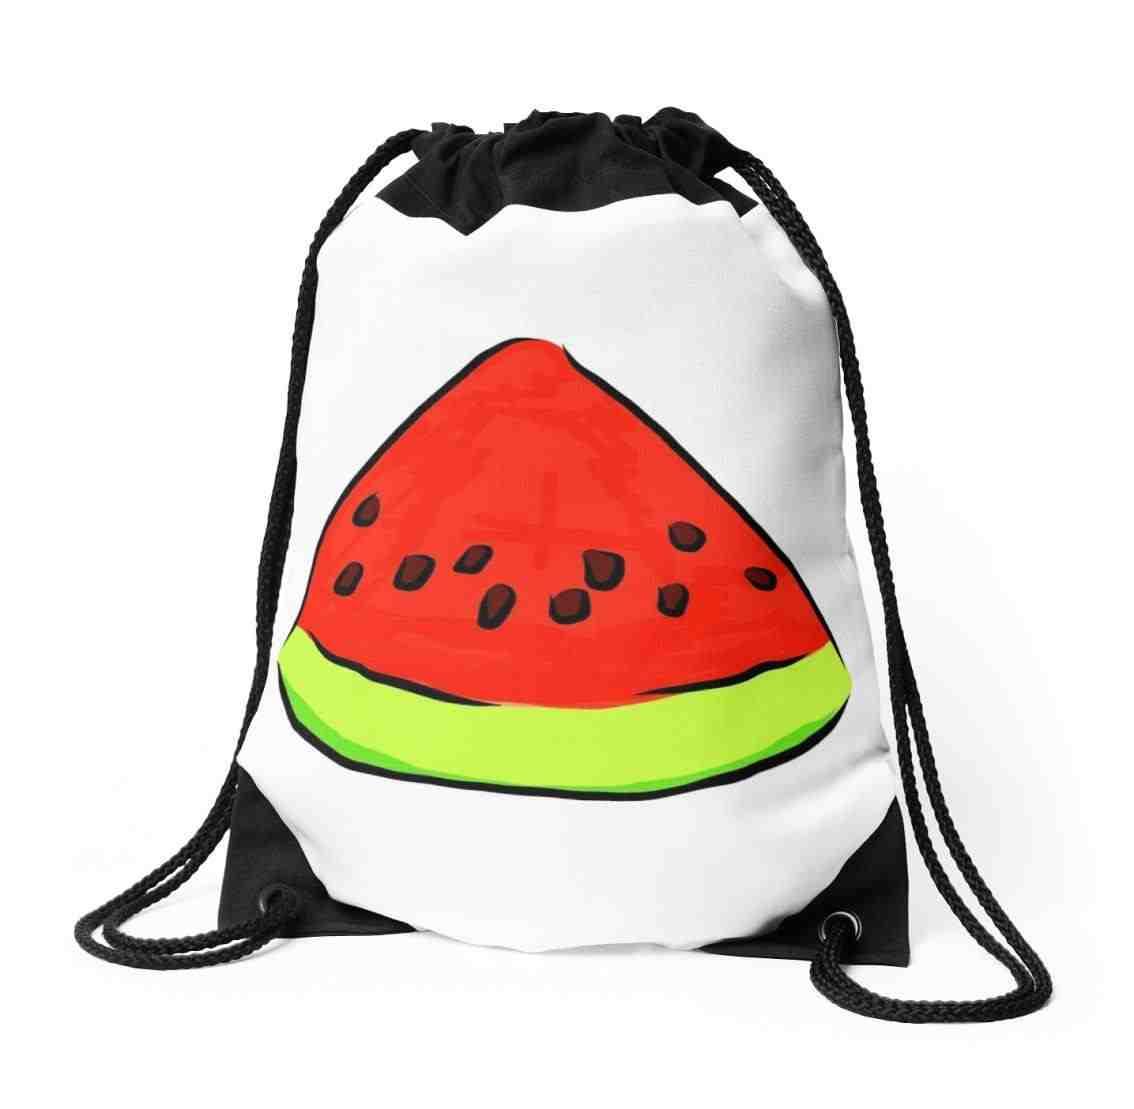 1134x1109 Sans Grossir Foodrhcom Laptop Stickers Clipart Blogger